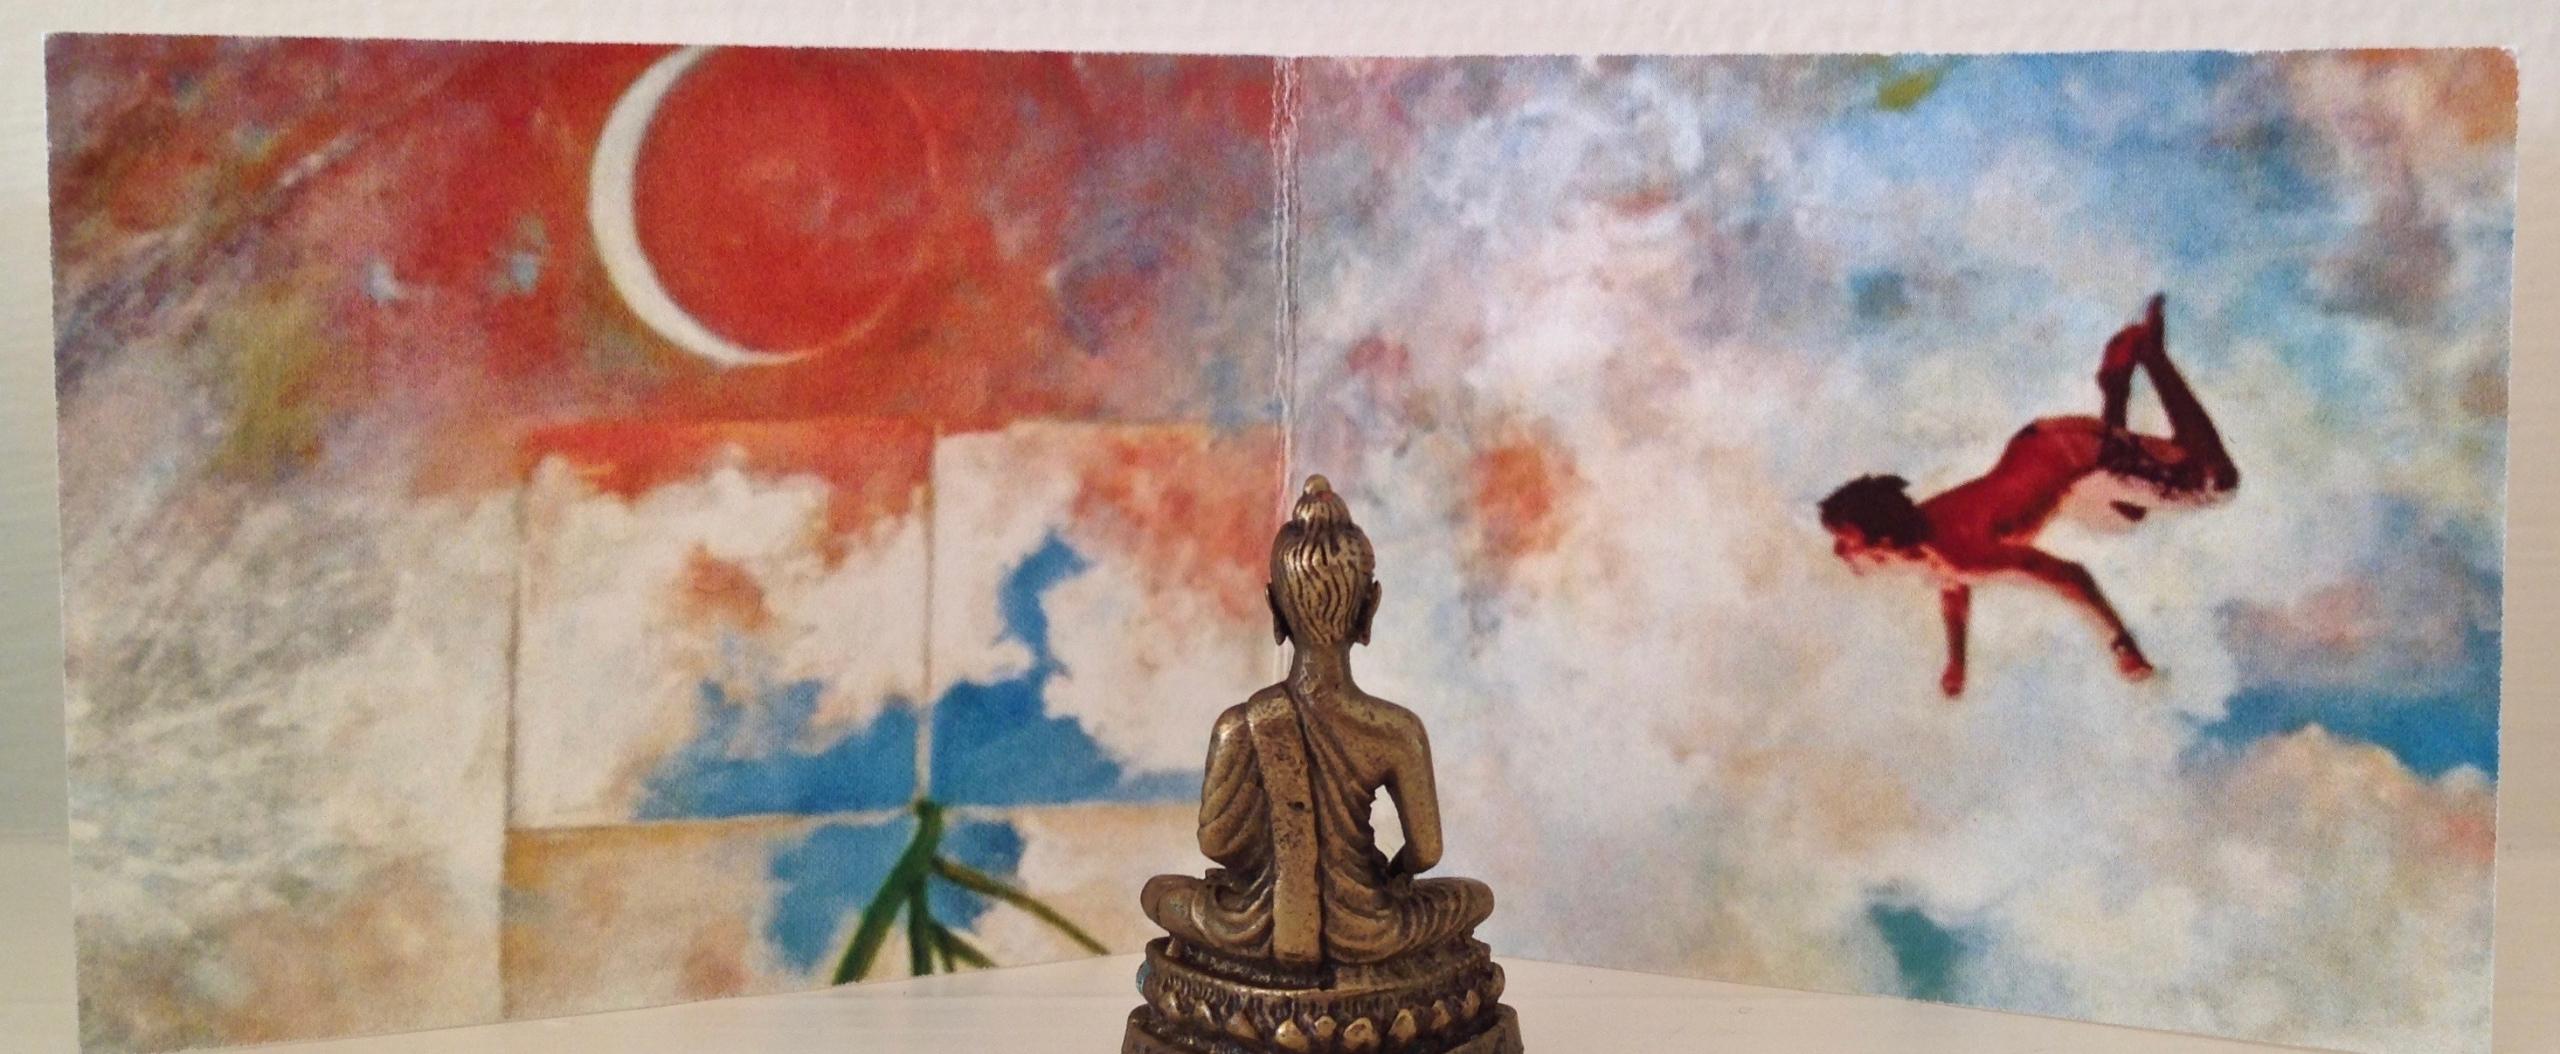 Art meditaion (@koshen) Cover Image